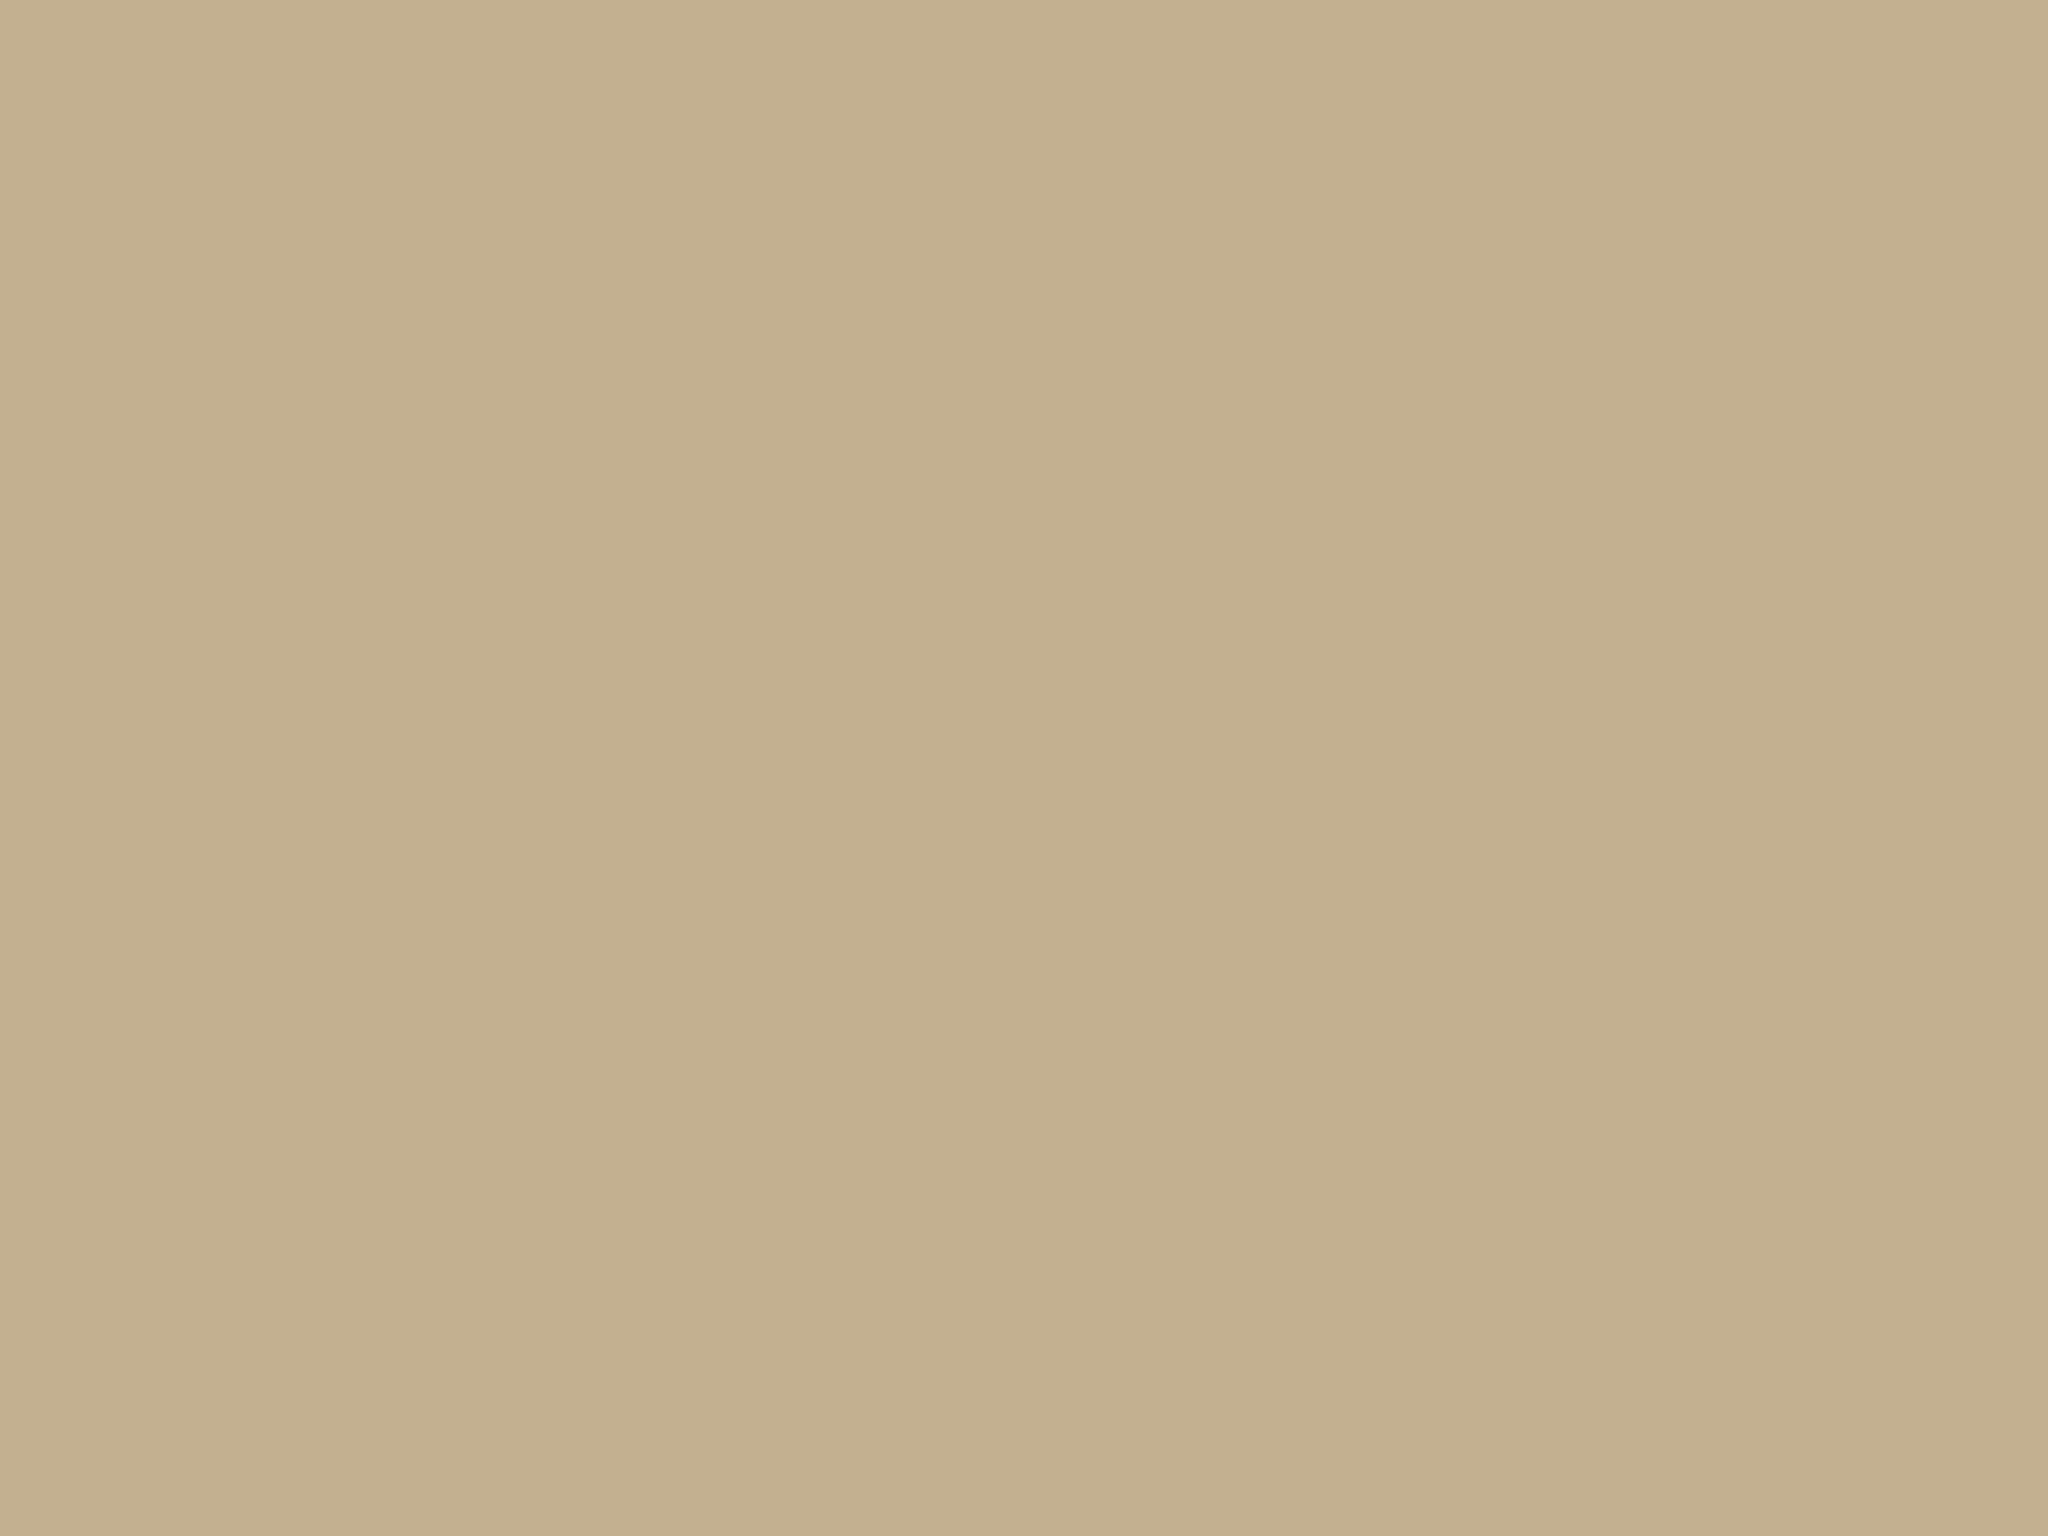 2048x1536 Khaki Web Solid Color Background